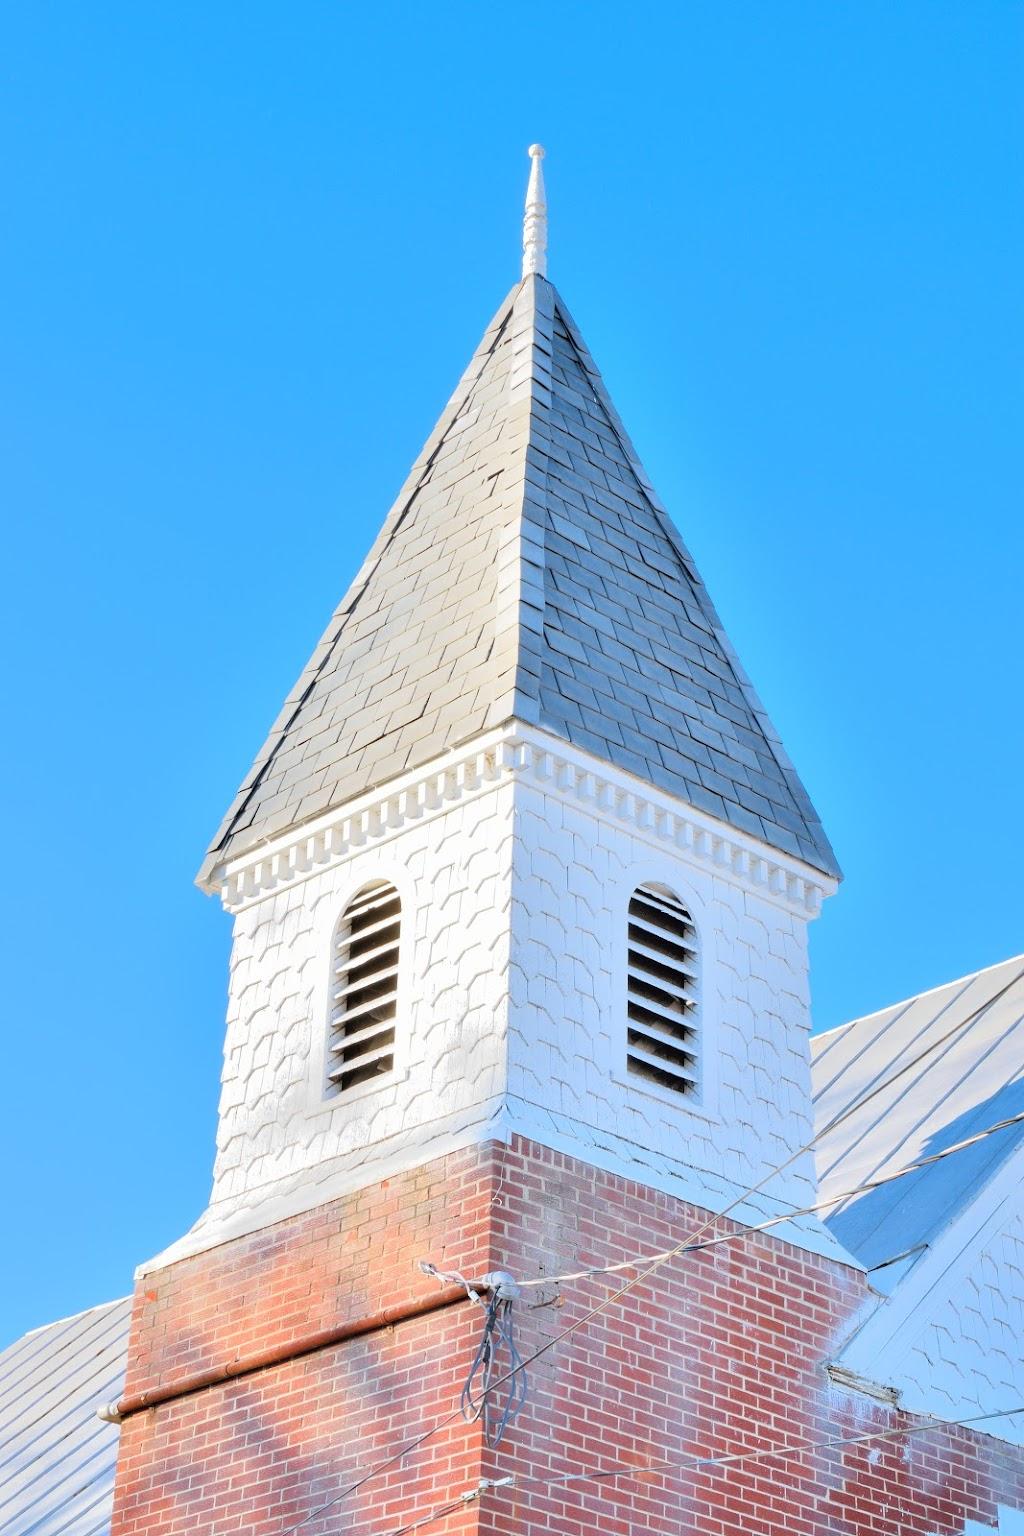 Macedonia AME Church - church  | Photo 6 of 8 | Address: 127 Pine St, Suffolk, VA 23434, USA | Phone: (757) 539-4502